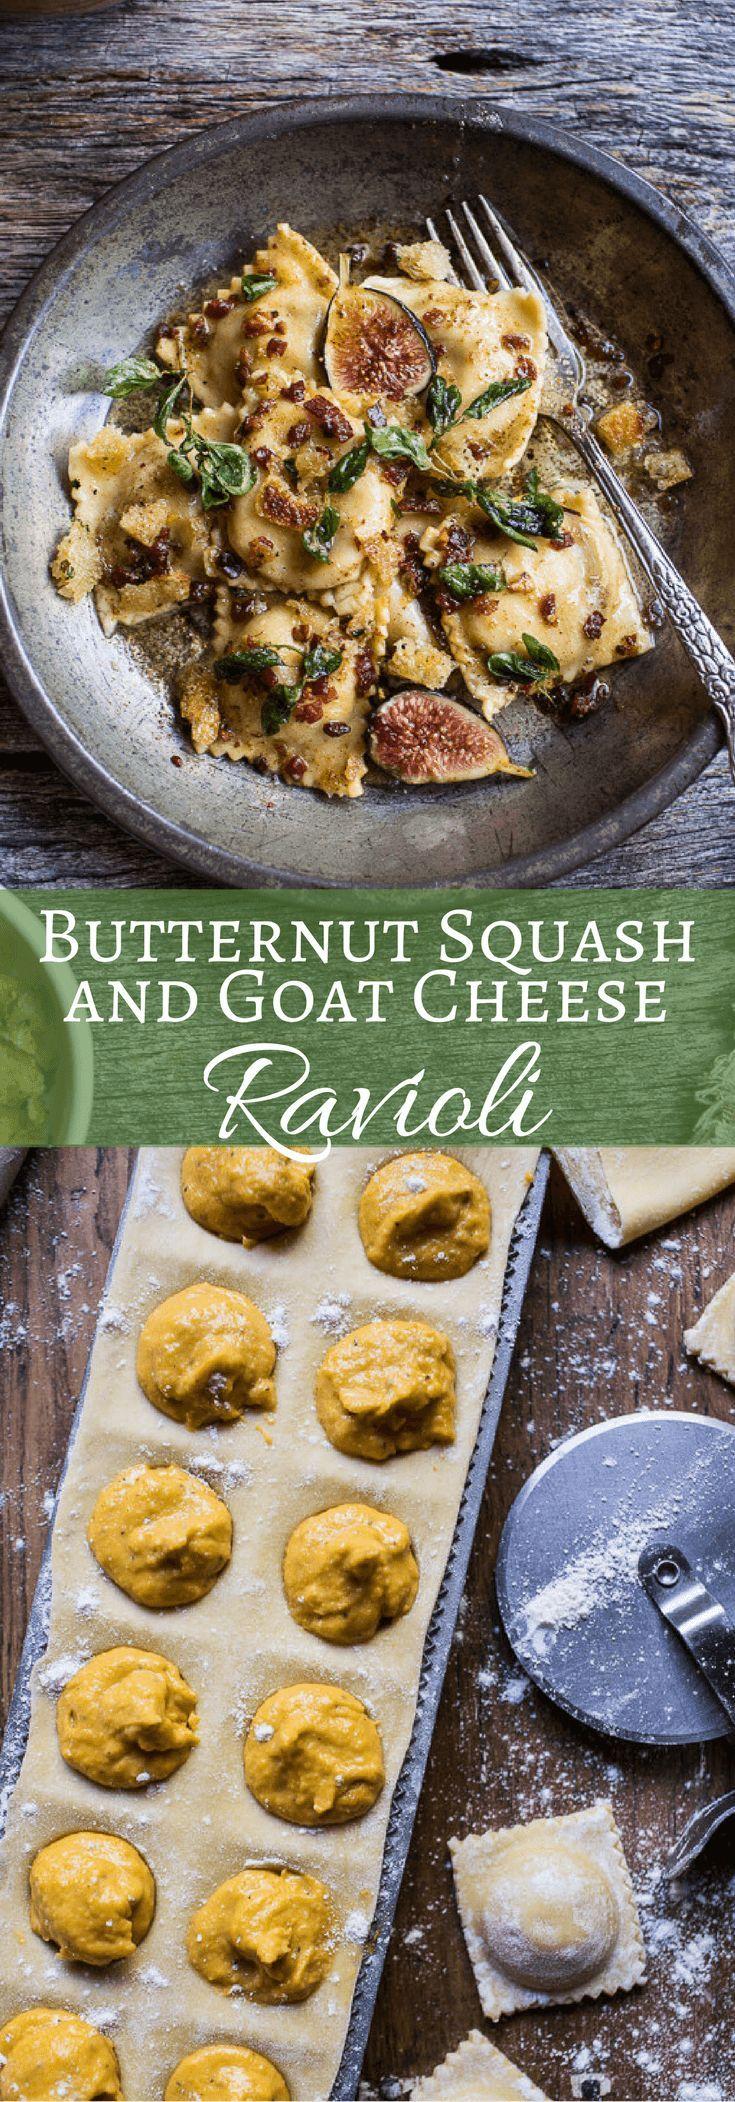 Butternut Squash and Goat Cheese Ravioli   http://halfbakedharvest.com /hbharvest/